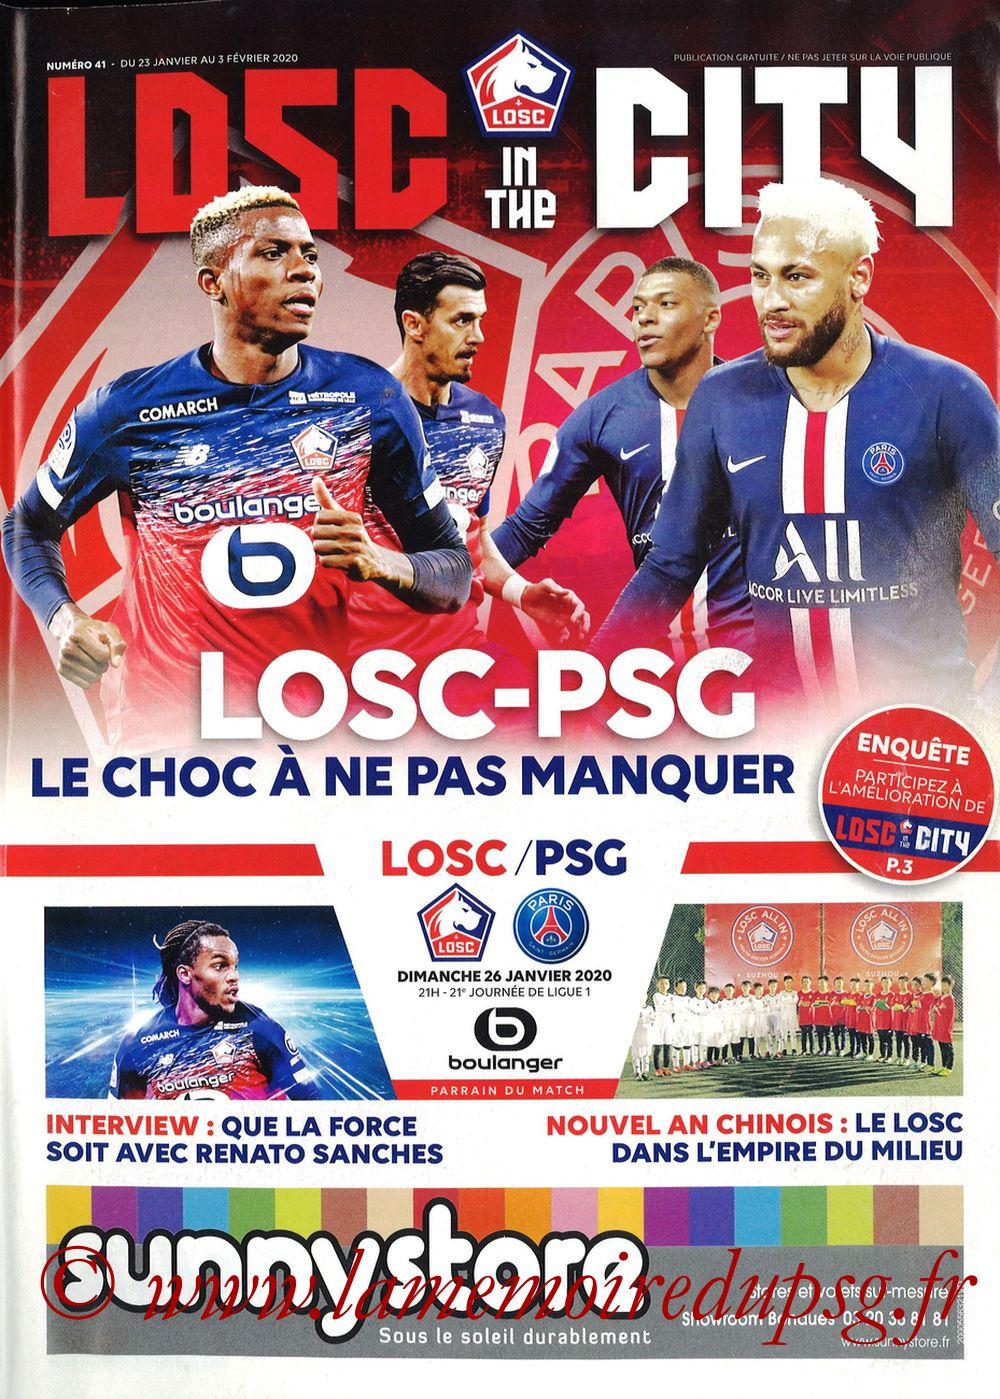 2020-01-25  Lille-PSG (21ème L1, Losc in the City N°41)